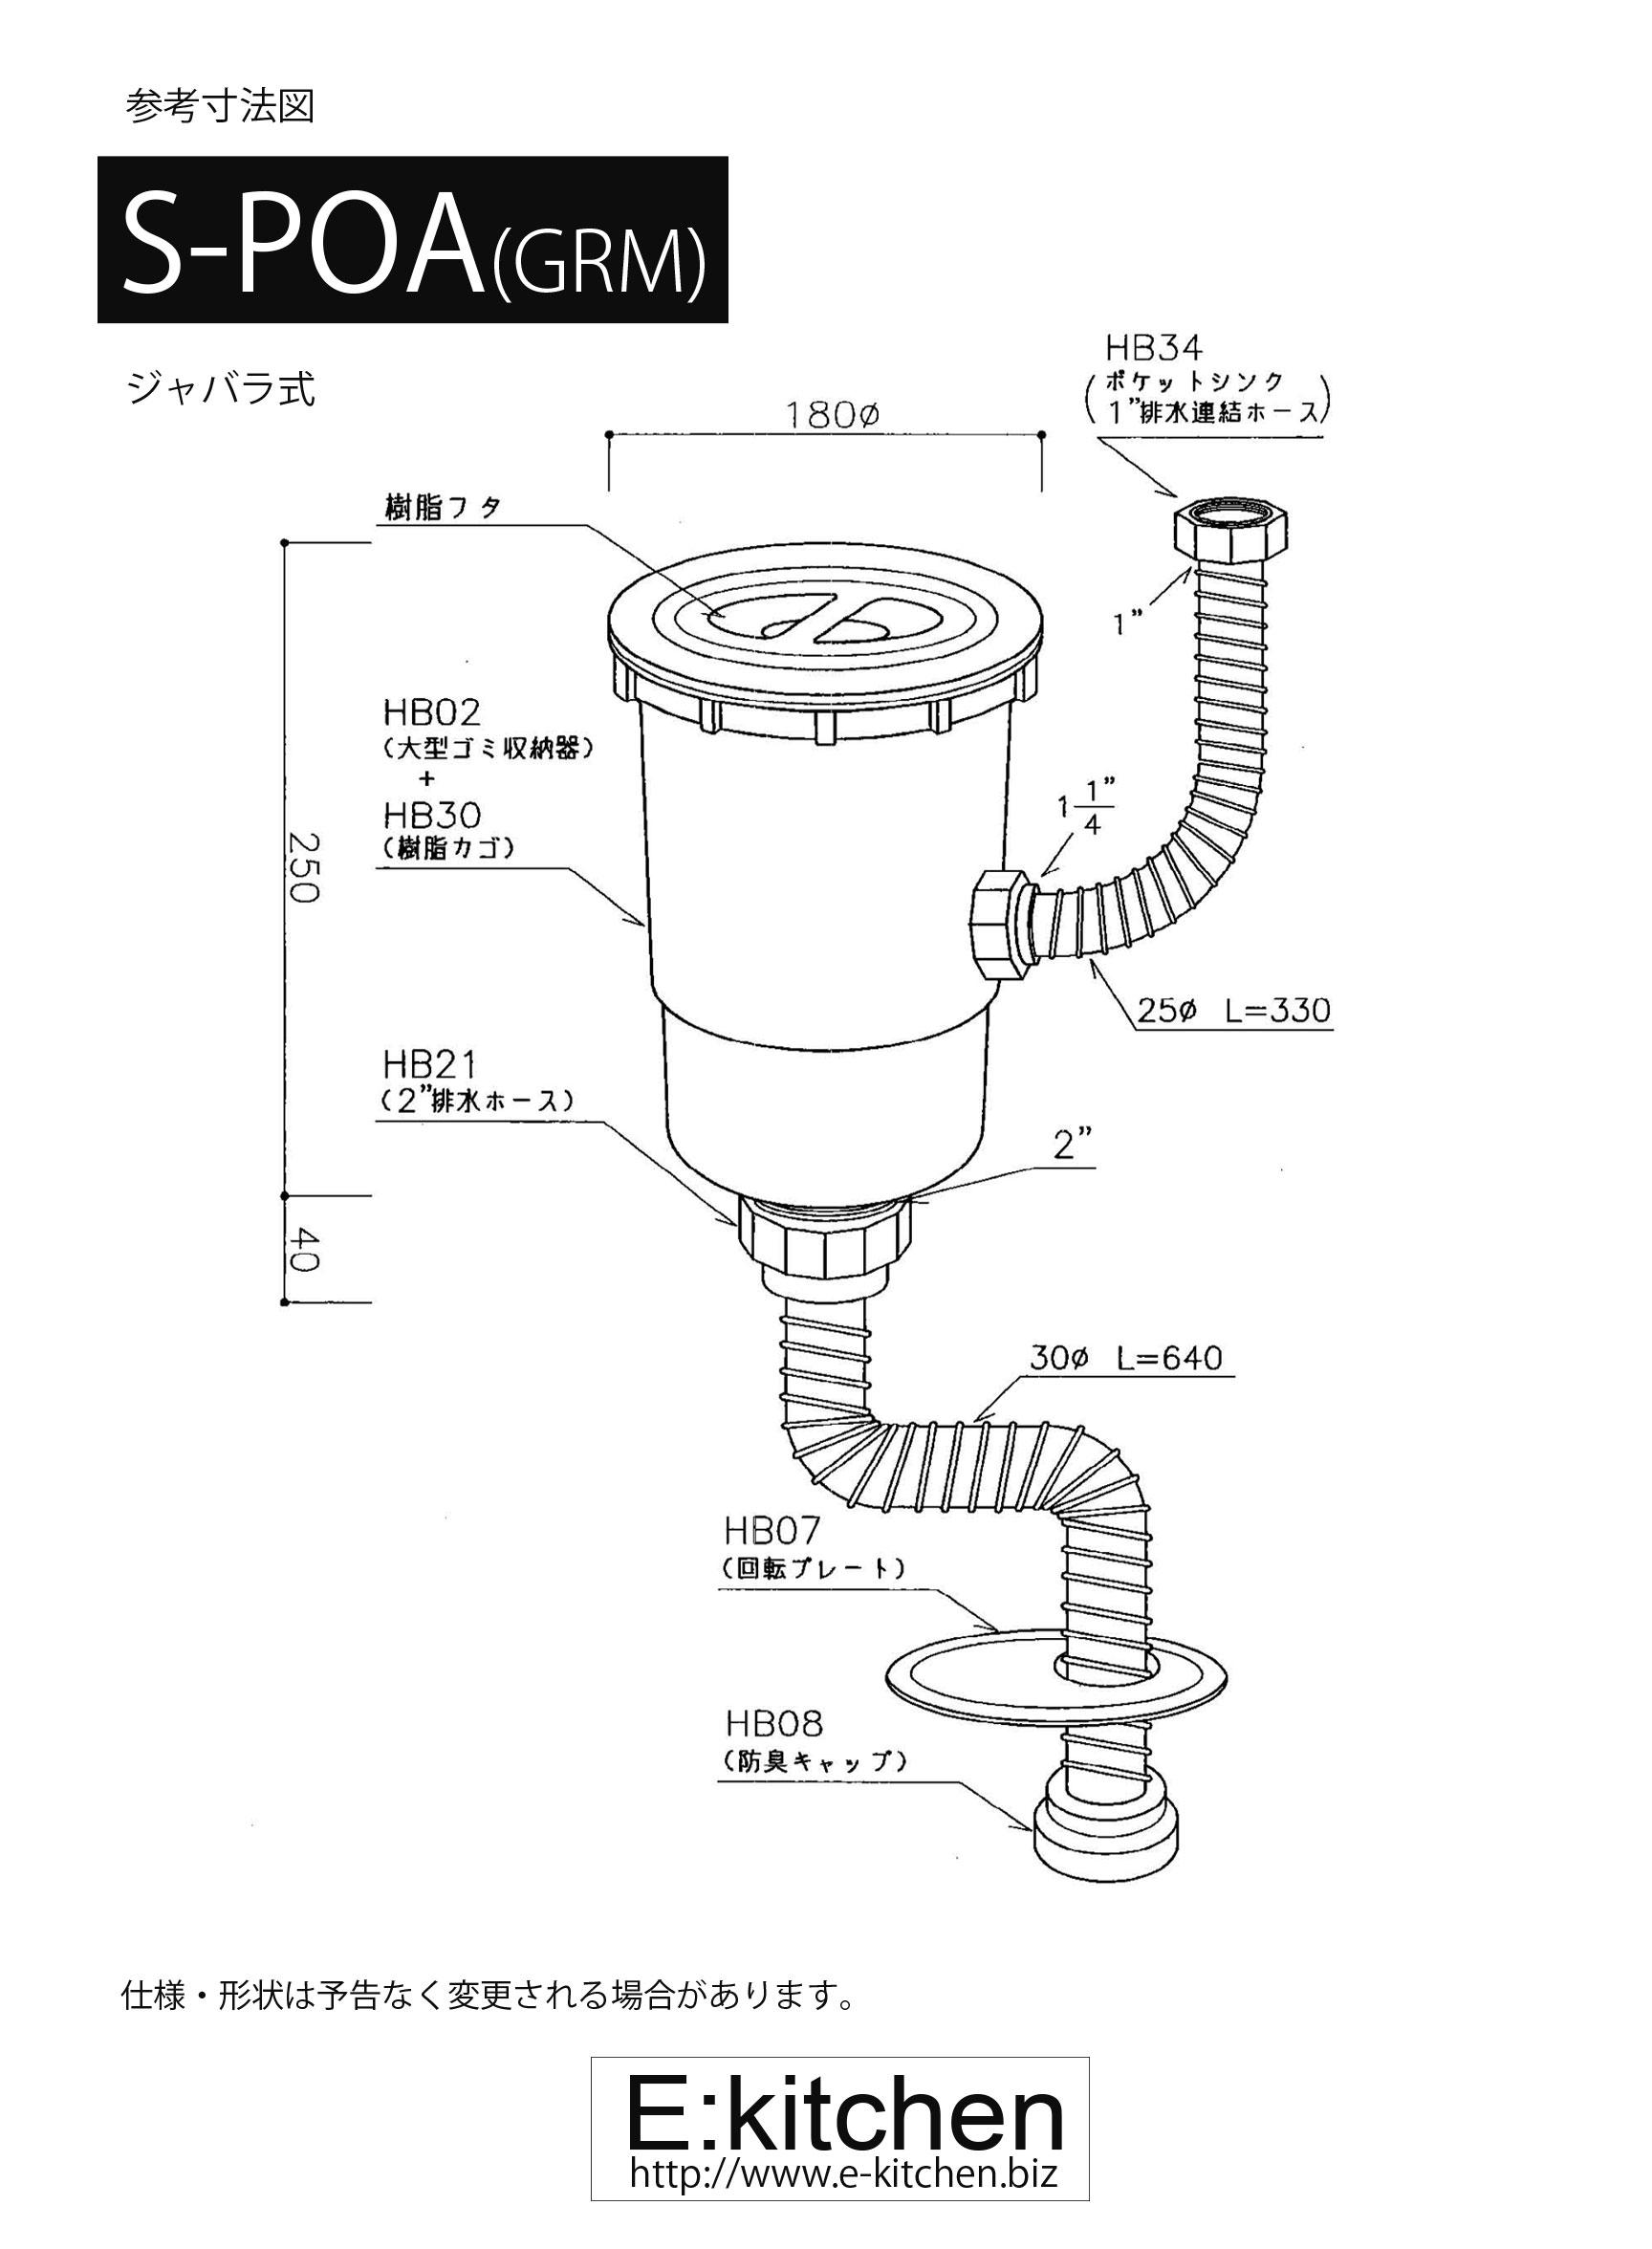 CKシリーズ 排水部品S-POA(GRM)